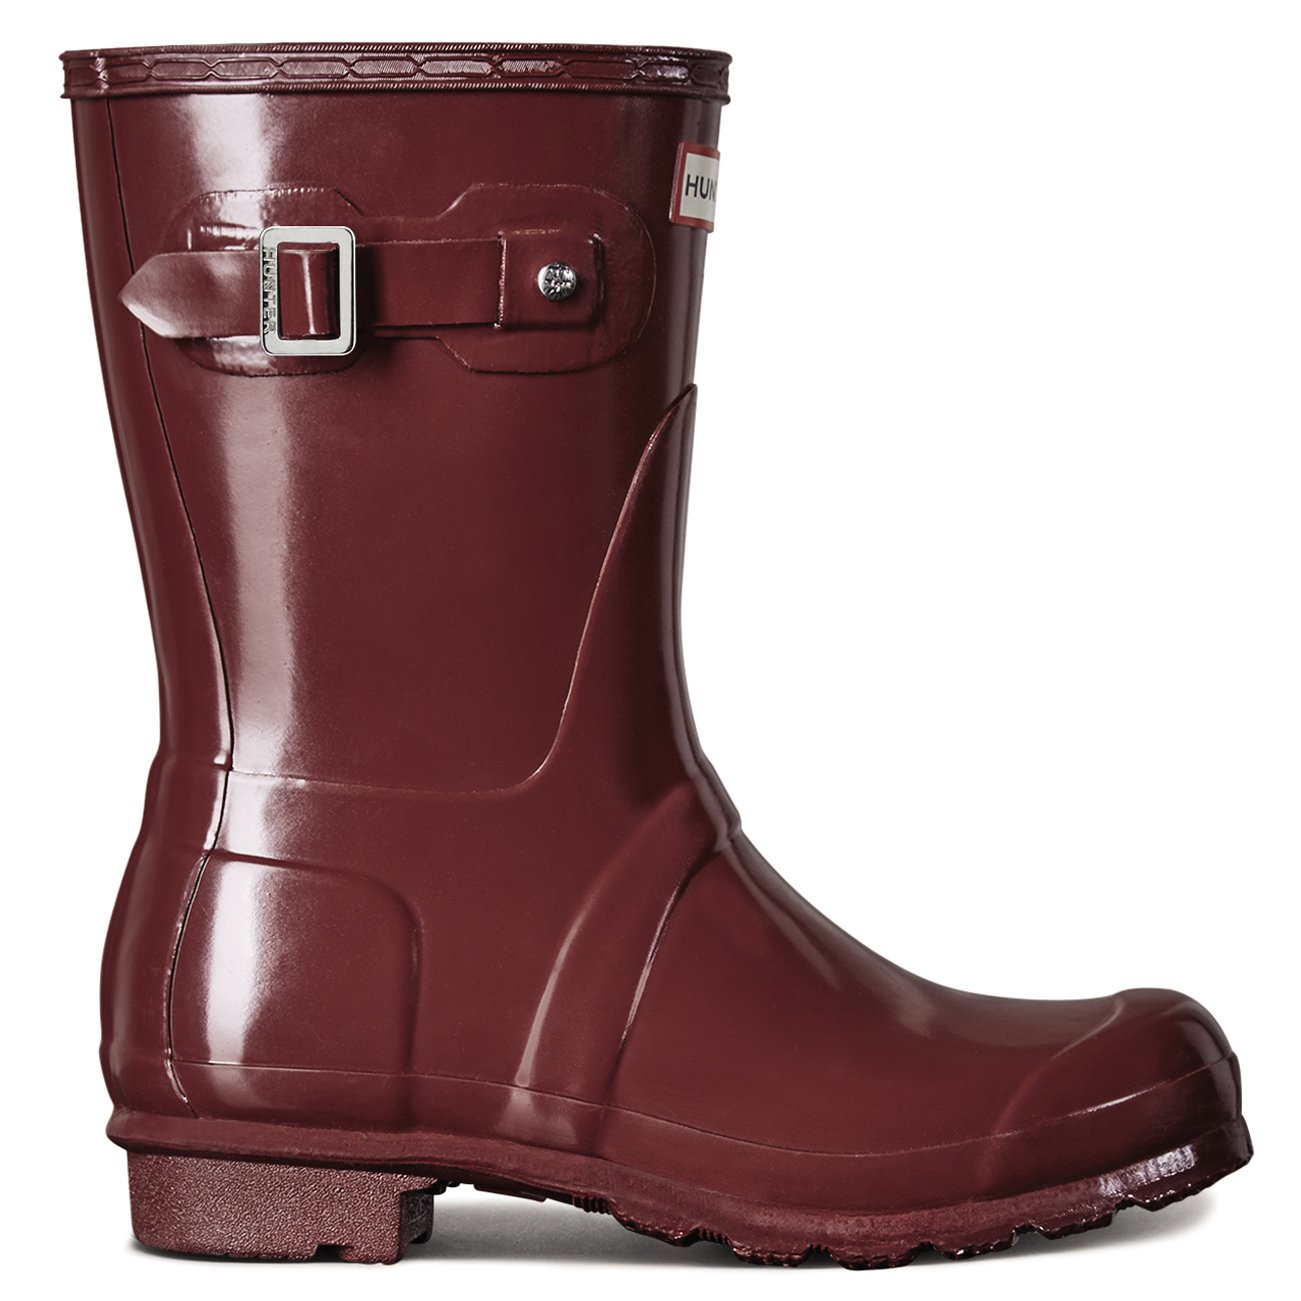 Women's Hunter Snow Boots Original Short Gloss Snow Hunter Rain Boots Water Boots Unisex 5-10 B00WPT00HC 6 B(M) US|Damaszenerpflaume 2ce341